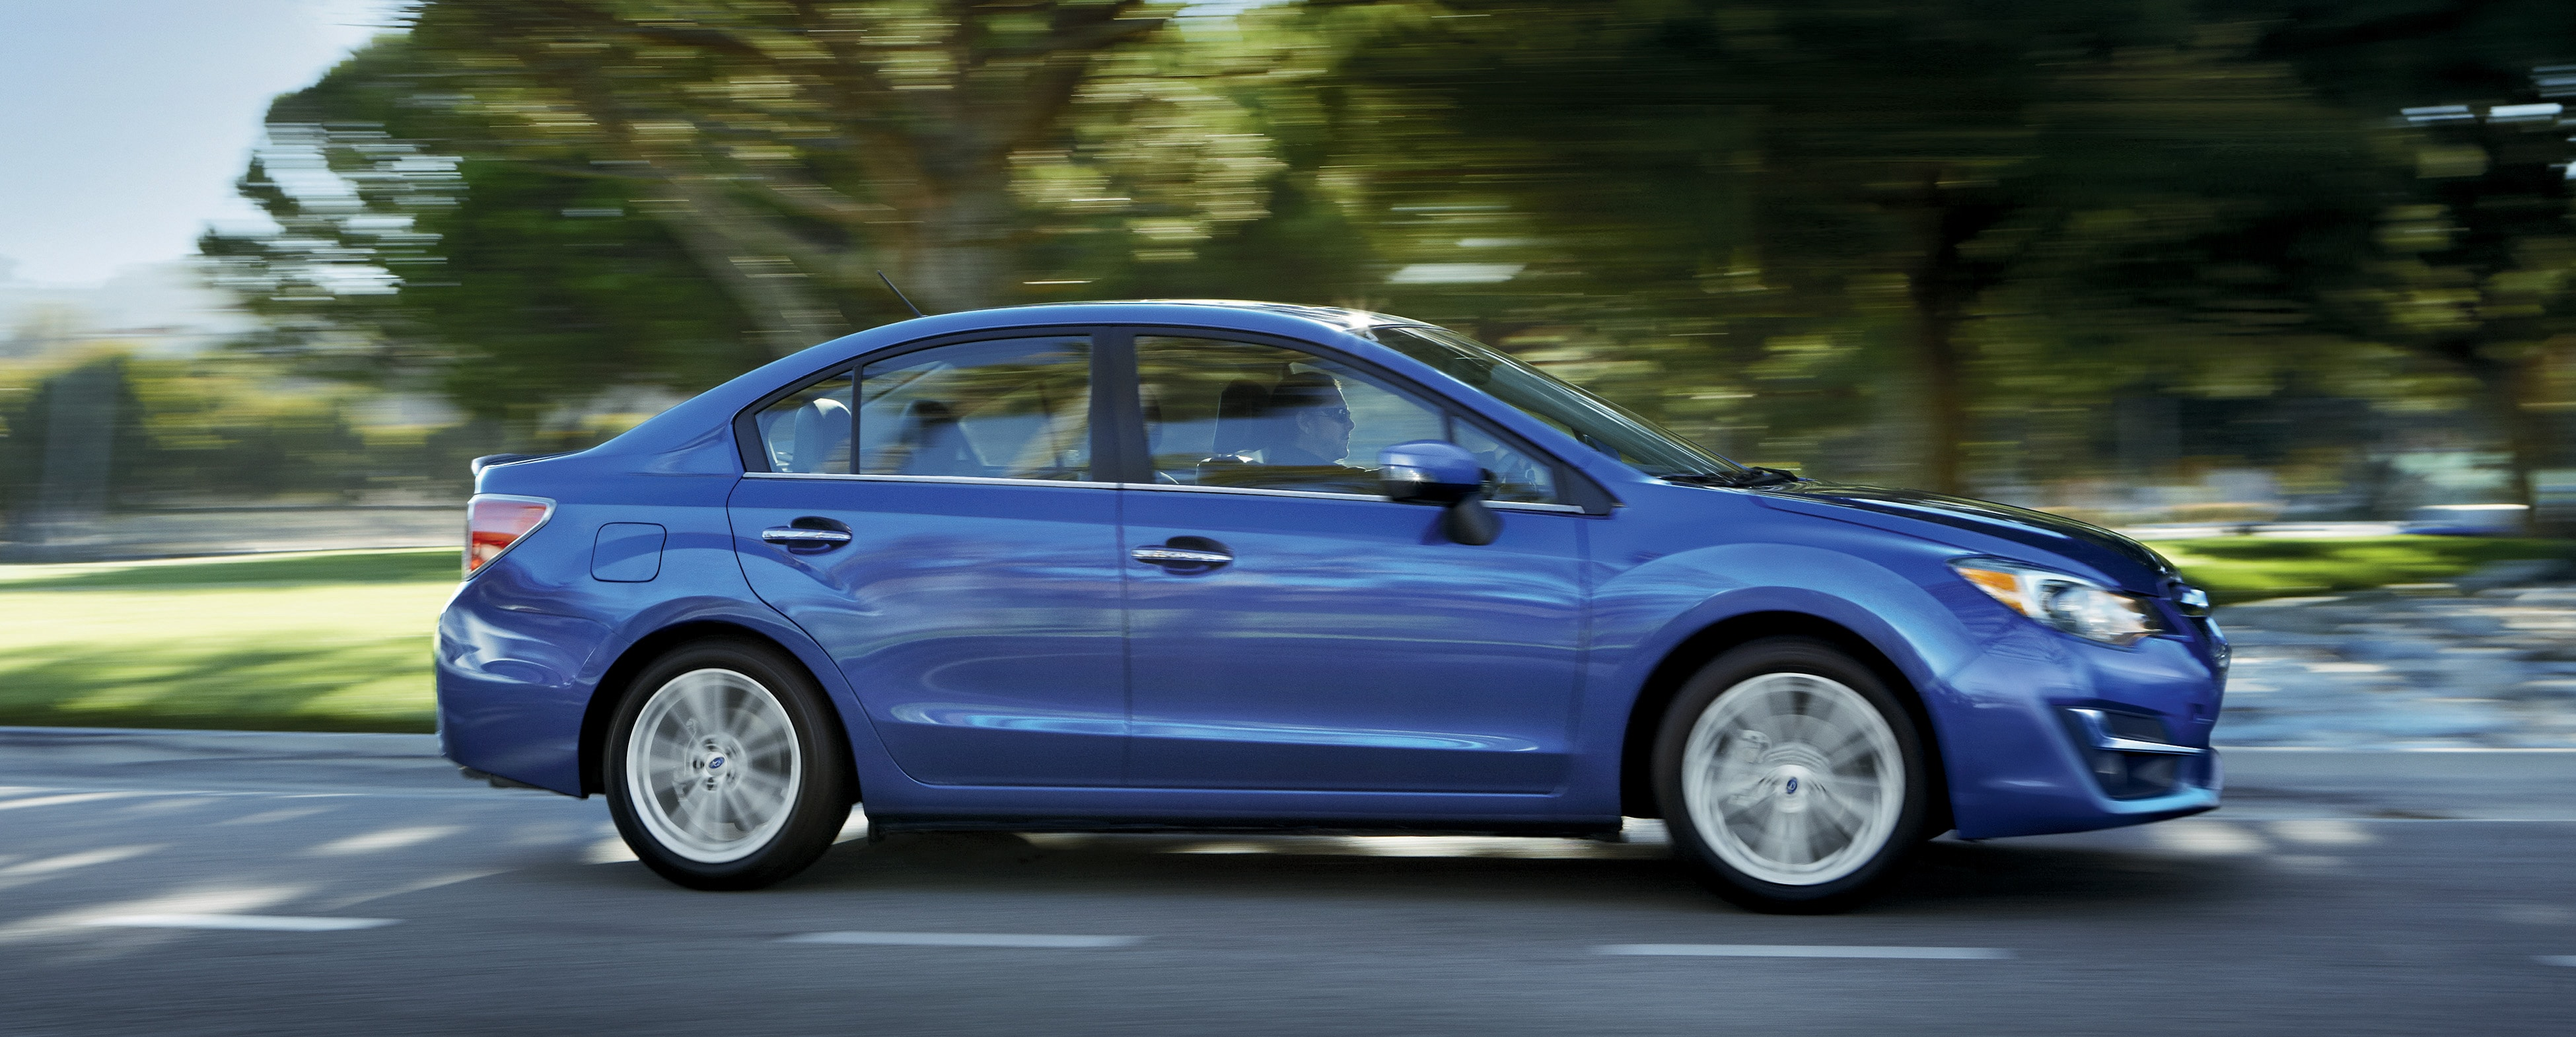 2015 Subaru Impreza new features model selection pricing colors